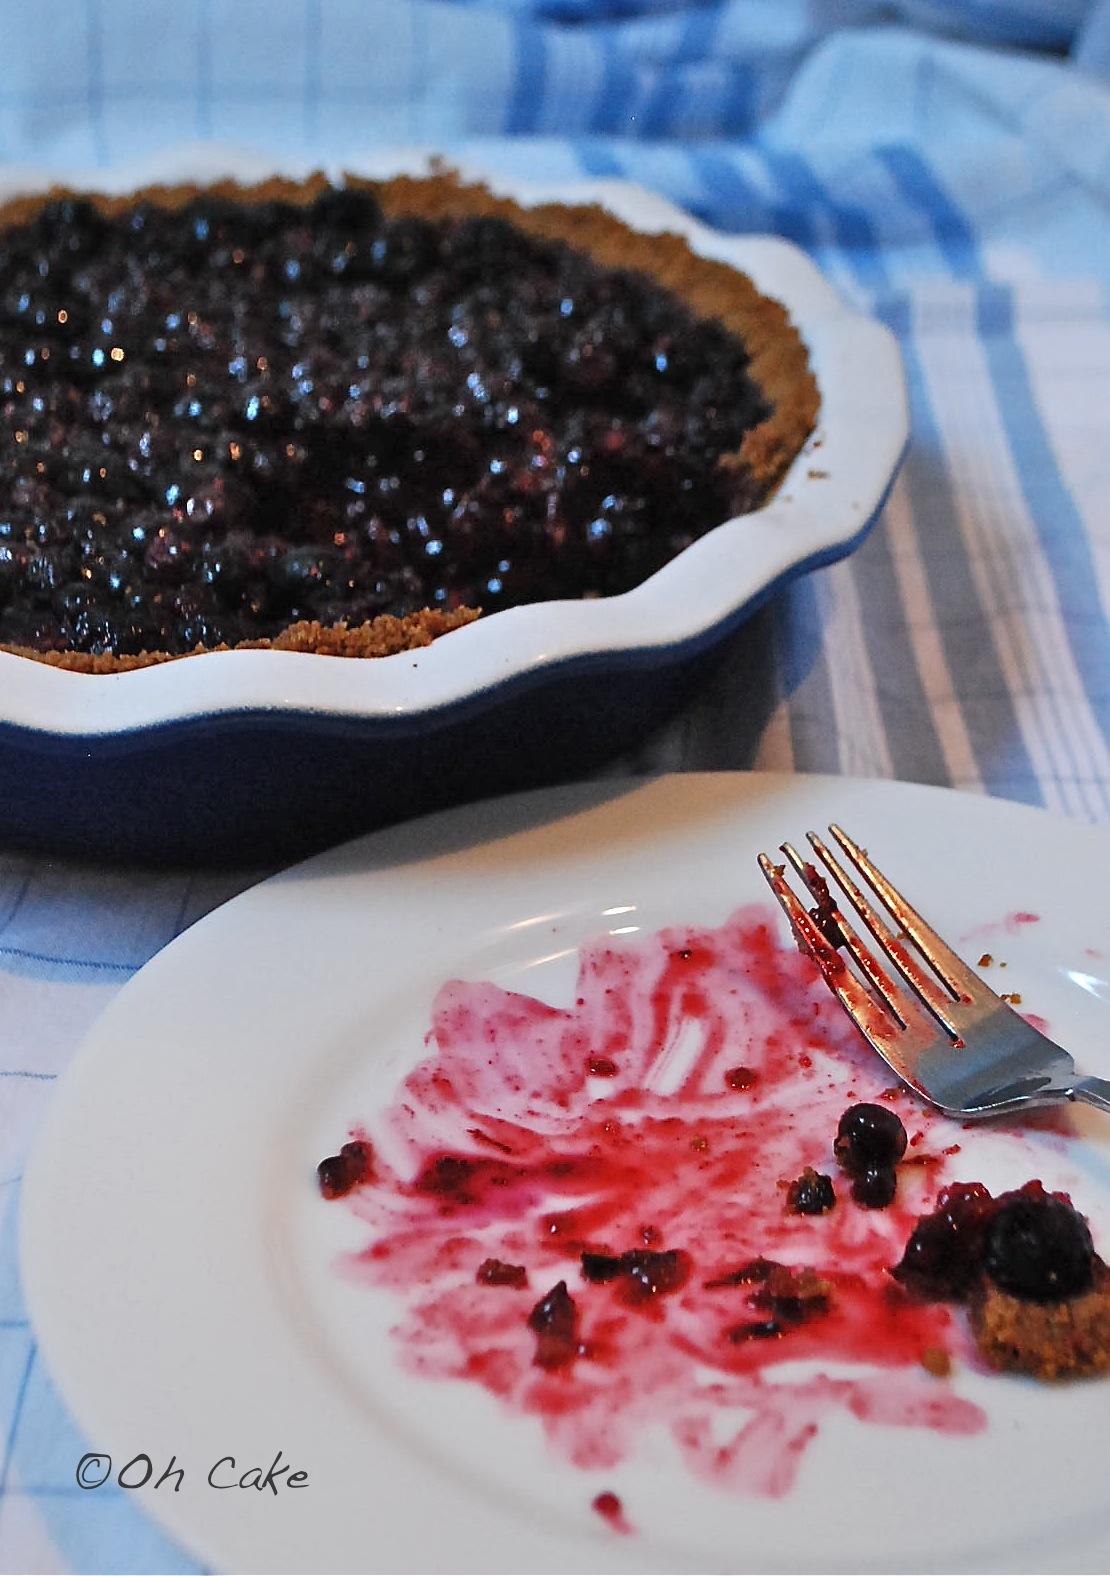 http://3.bp.blogspot.com/-evfIim4PqoQ/T-G8-hh78WI/AAAAAAAABpQ/ciUhae7WFjc/s1600/no+more+pie.jpg